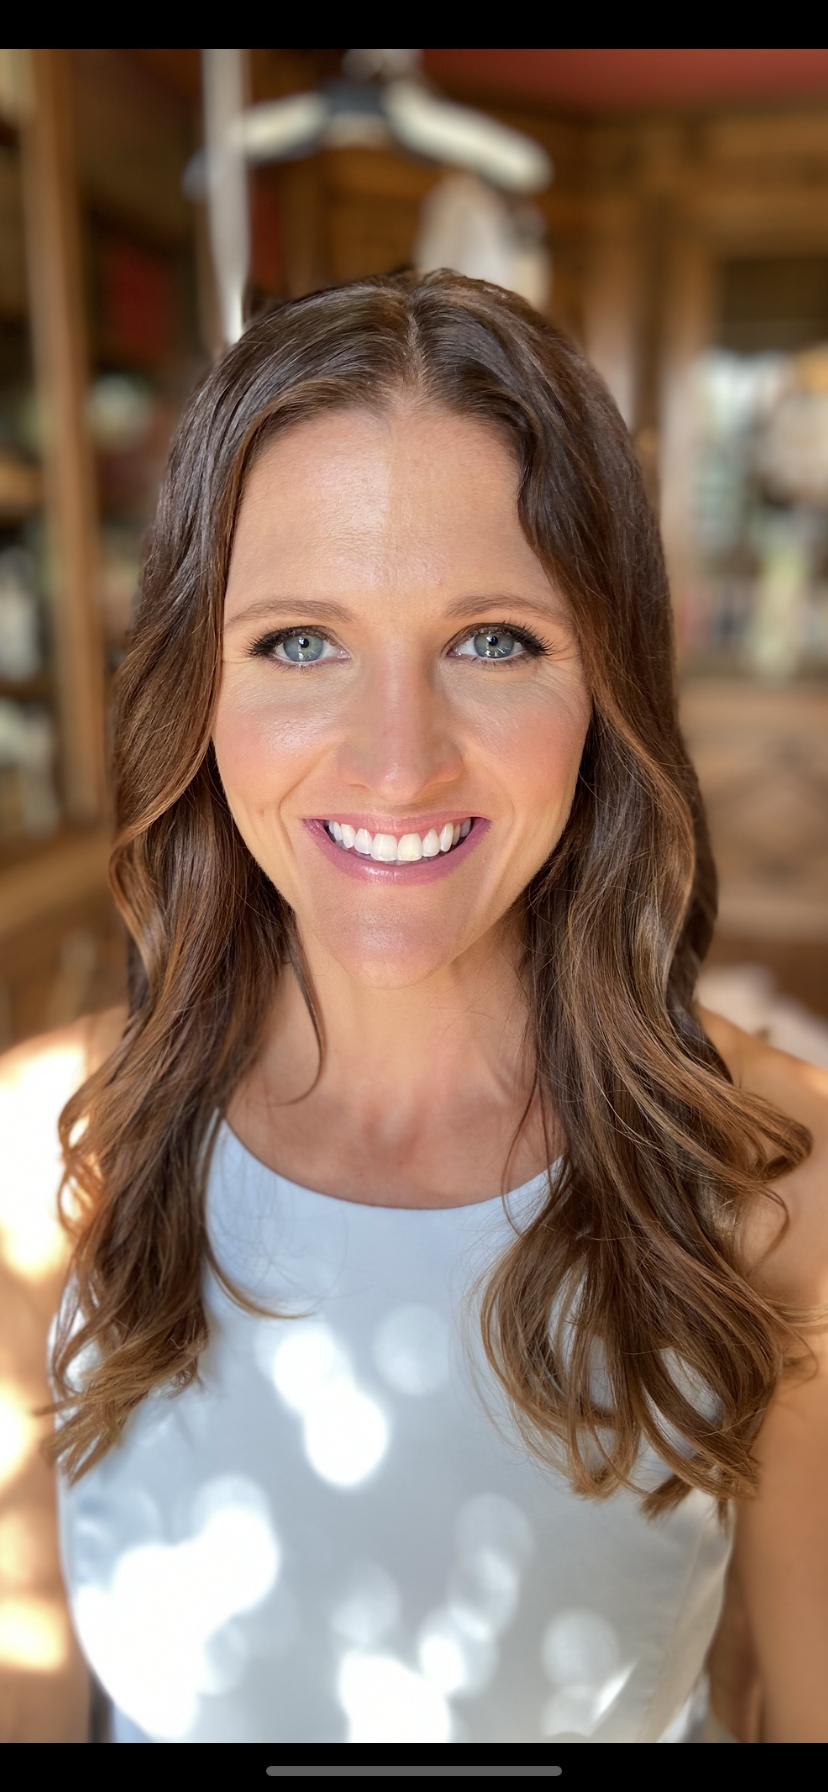 Soft glowing makeup - Make Me Bridal Artist: Jessica Makeup and Hairstyling. #naturalmakeup #bridalmakeup #loosecurls #softupdo #glowingskin #hampshiremakeupartist #weddingmakeupartisthampshire #hampshirehair